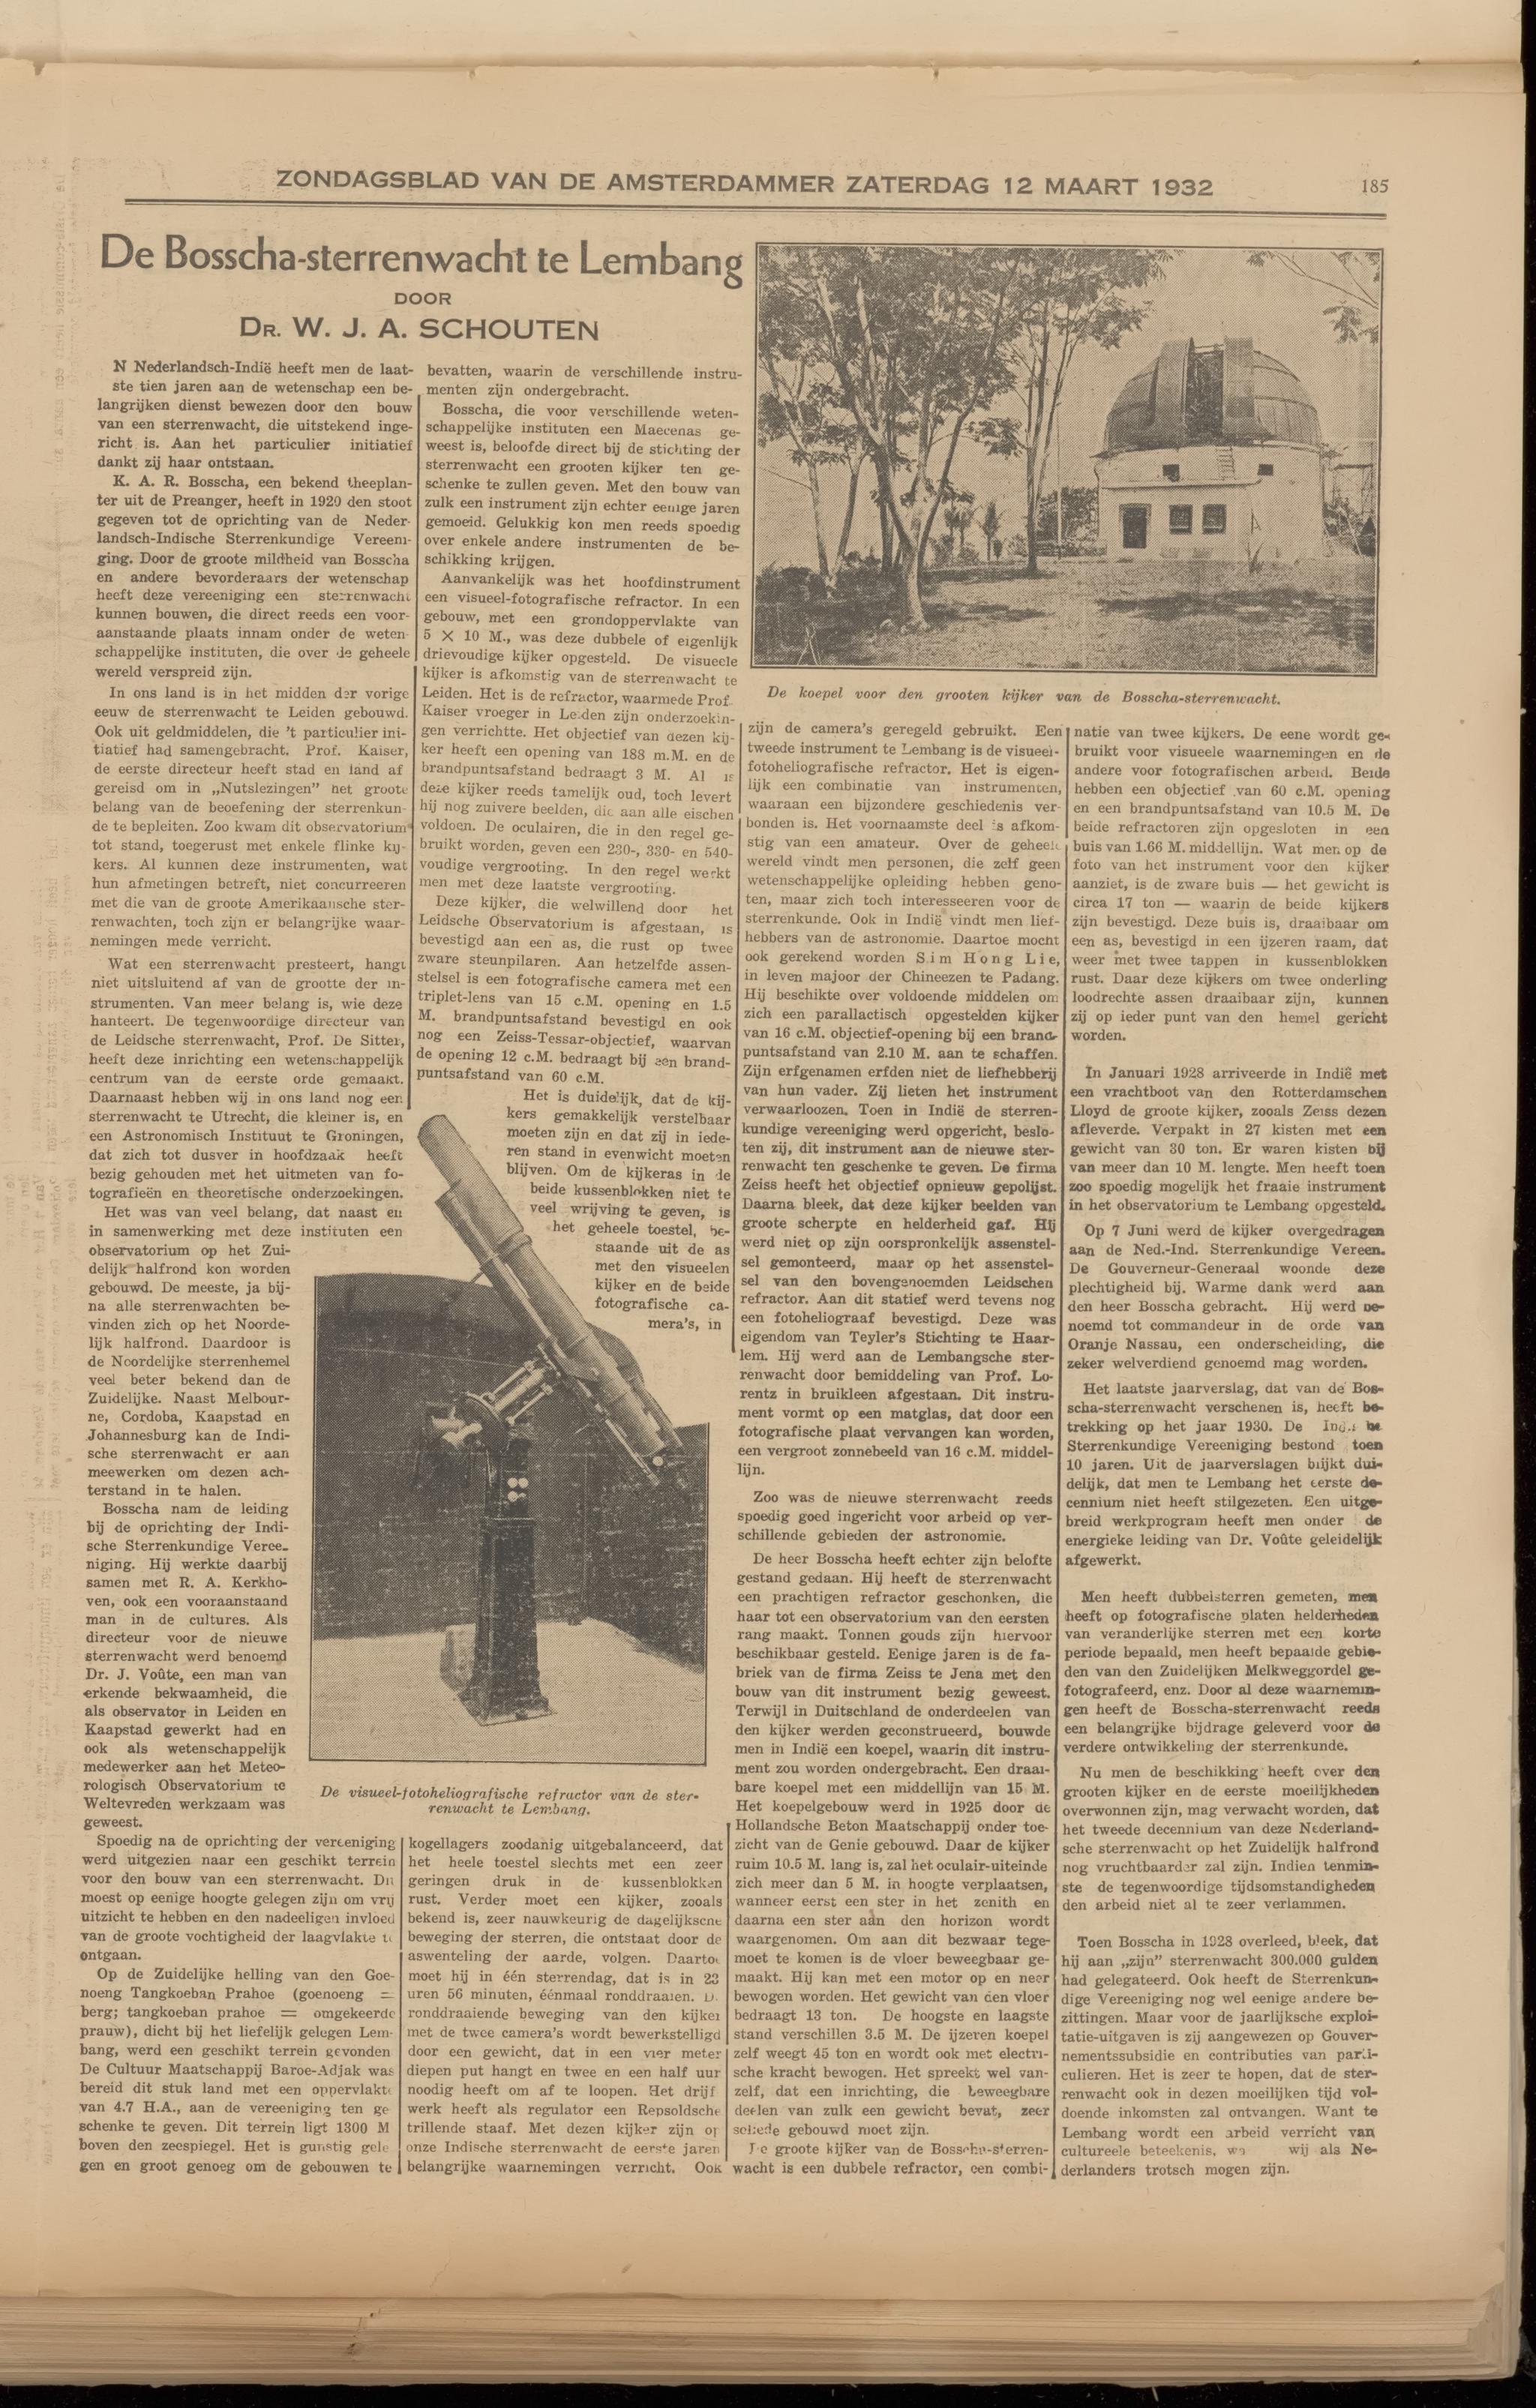 Artikel mengenai sejarah Observatorium Bosscha di surat kabar De Amsterdammer yang terbit pada 11 Maret 1932.